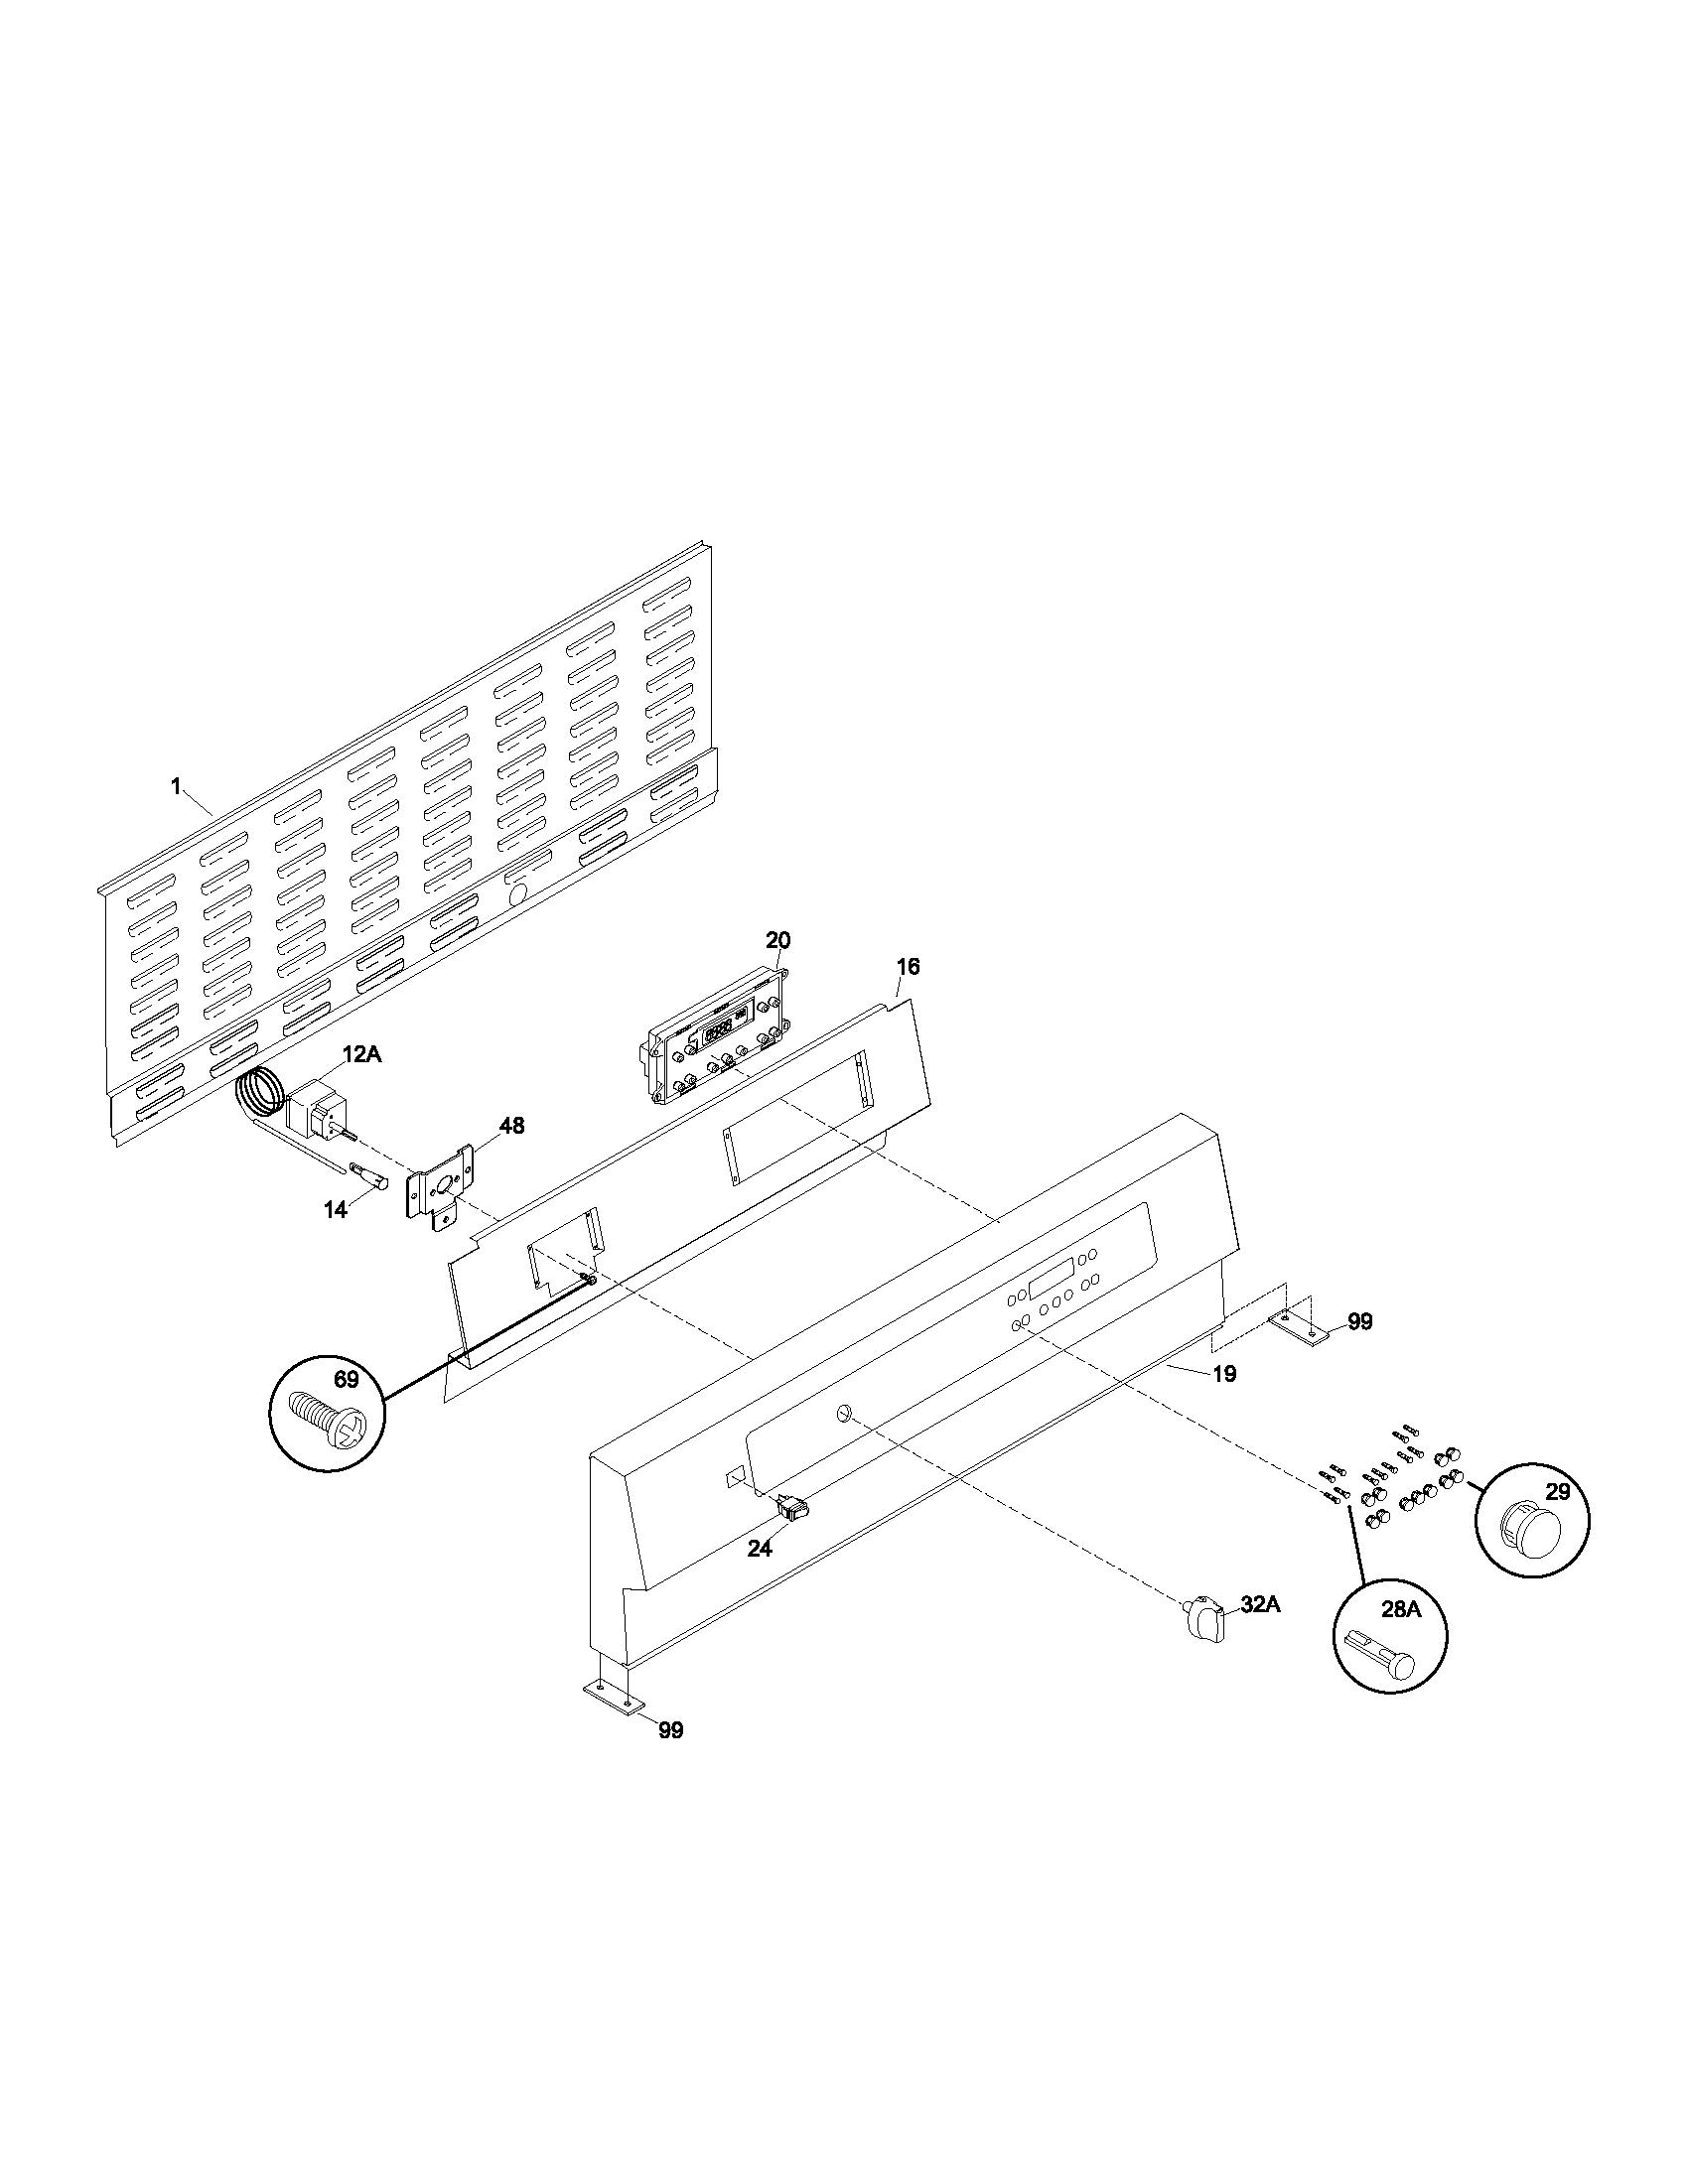 Kenmore Model 790 Electric Range Wiring Diagram, Kenmore